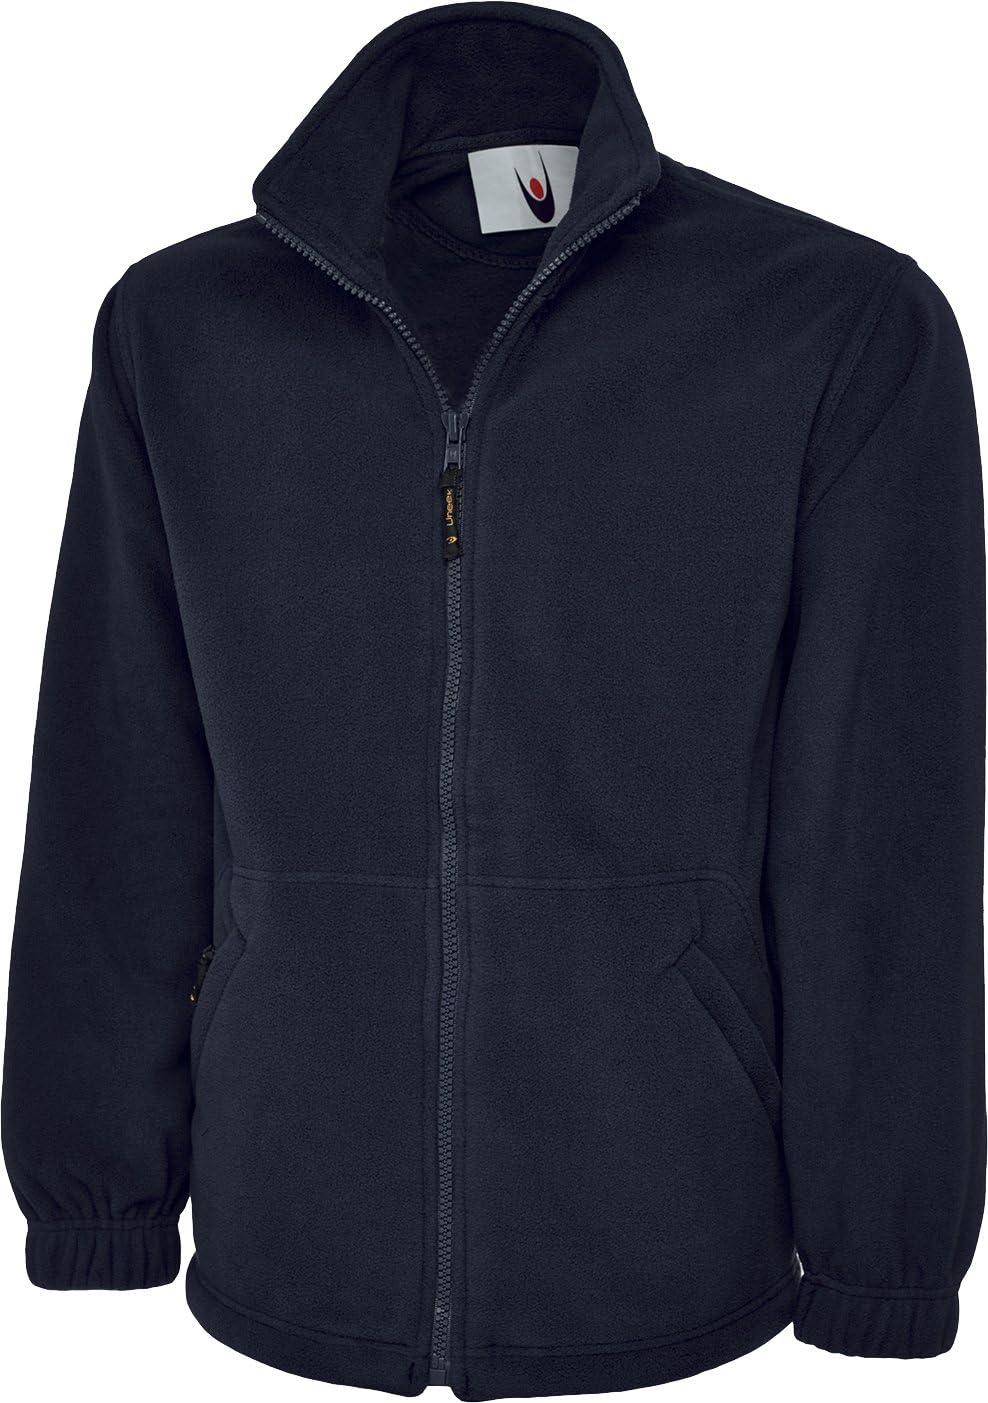 tama/ño xxx-large Unisex adulto Chaqueta Uneek Clothing UC604 color azul marino